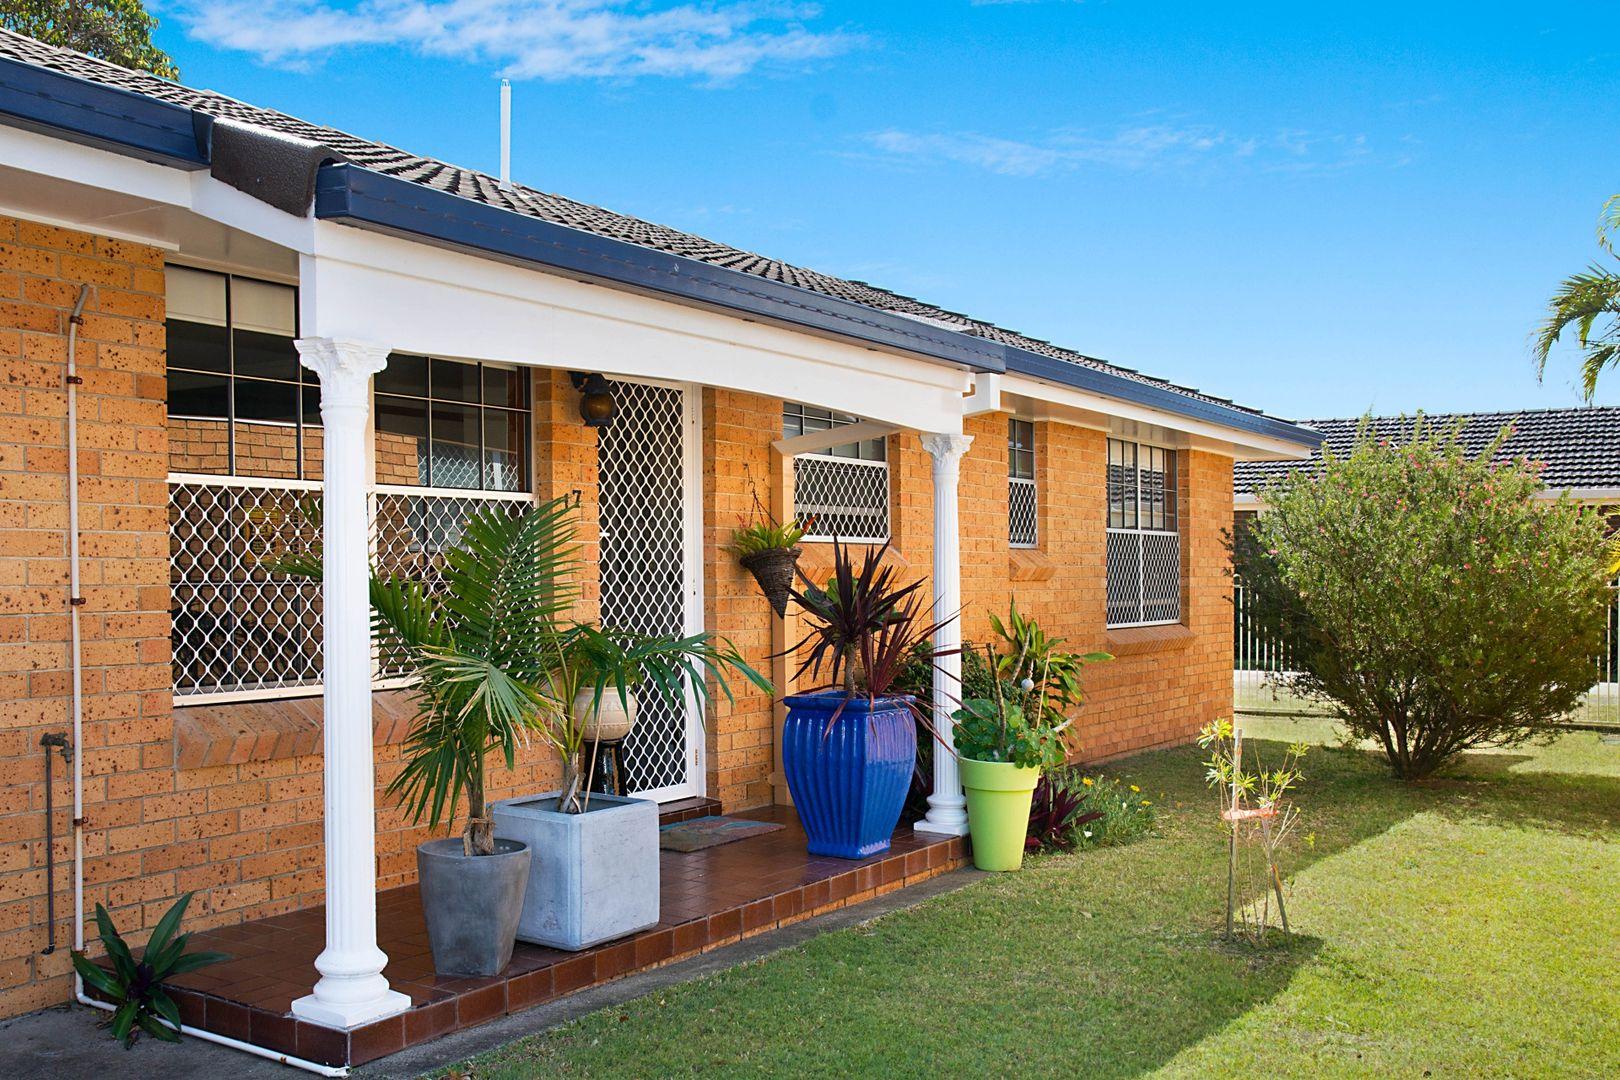 17/114 Cherry Street, Ballina NSW 2478, Image 1